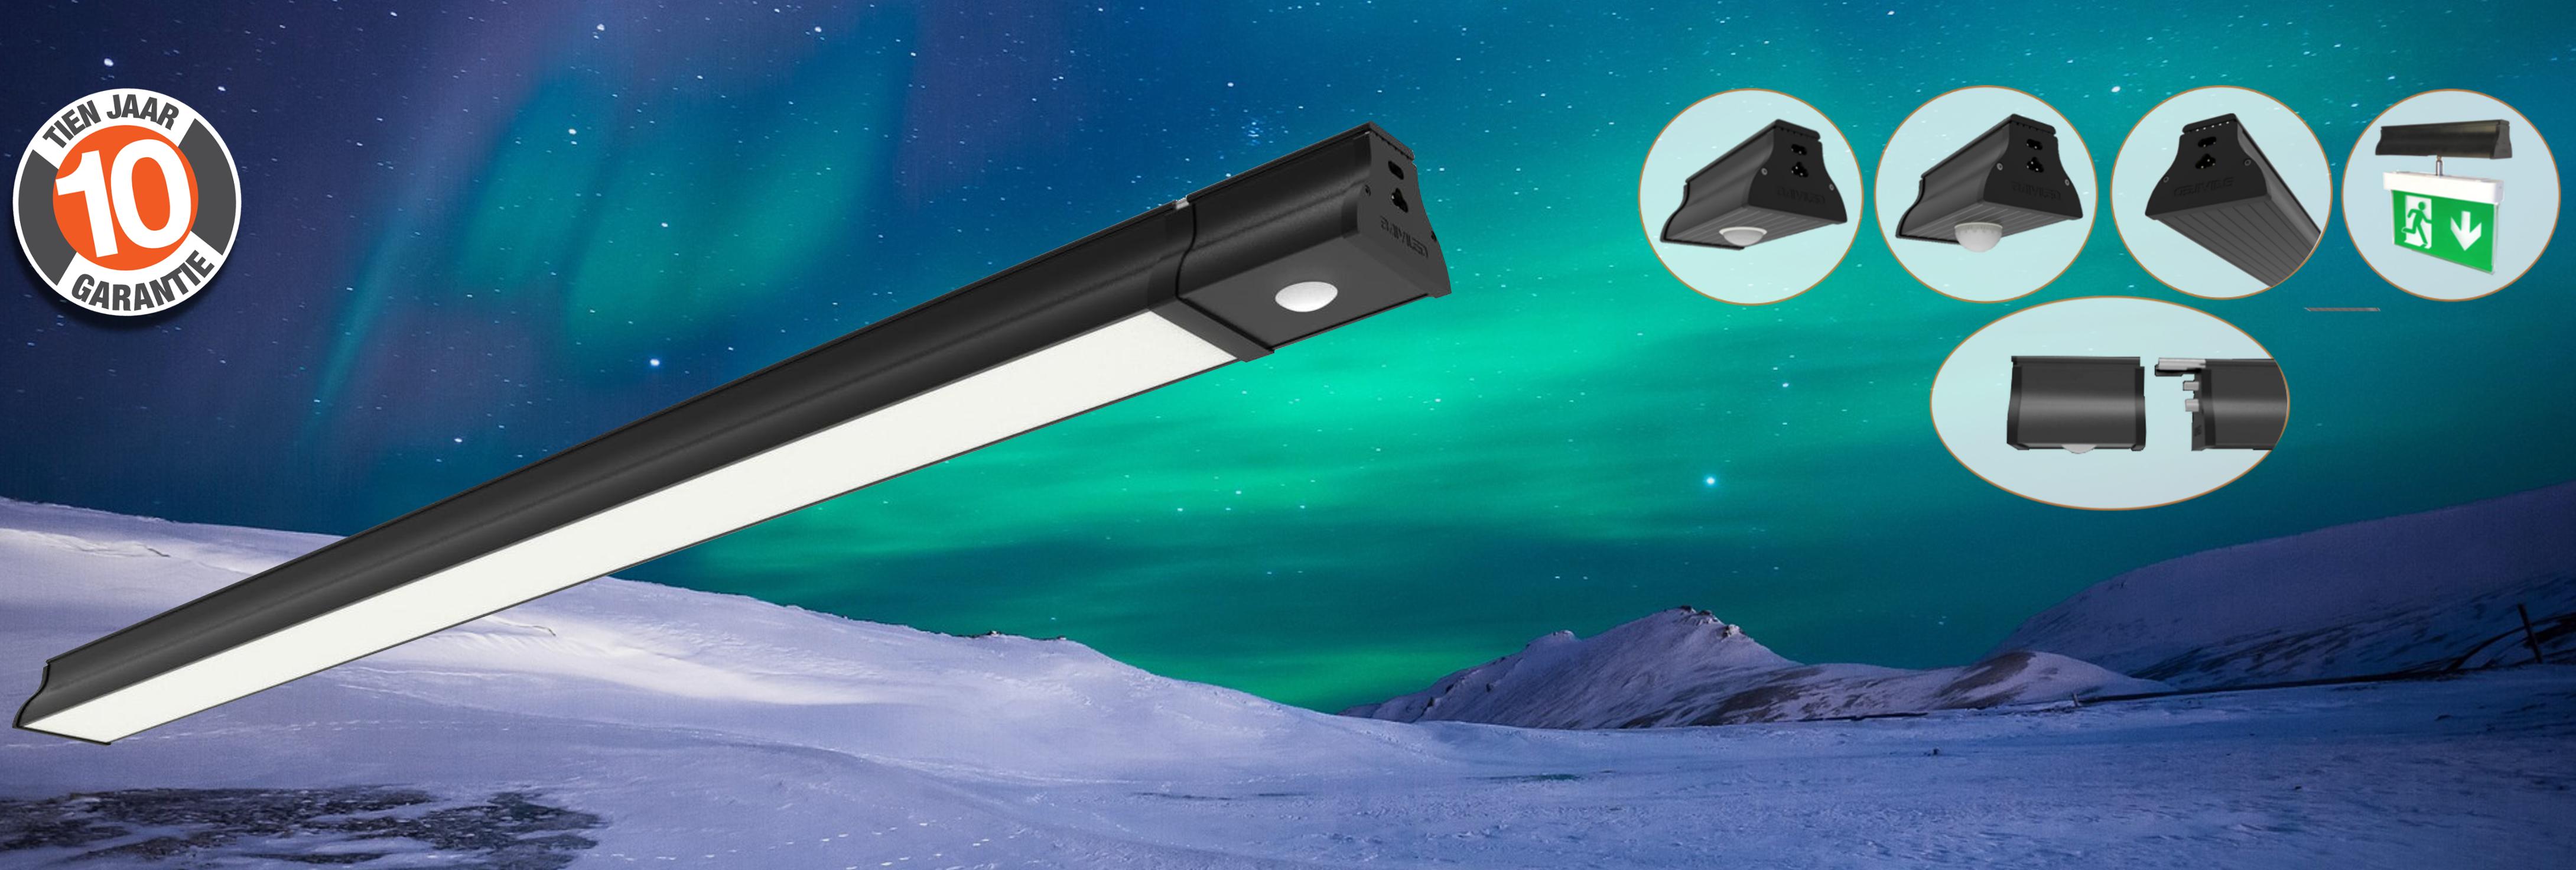 BAIYILED Aurora LED system met plugin & 10 jaar garantie